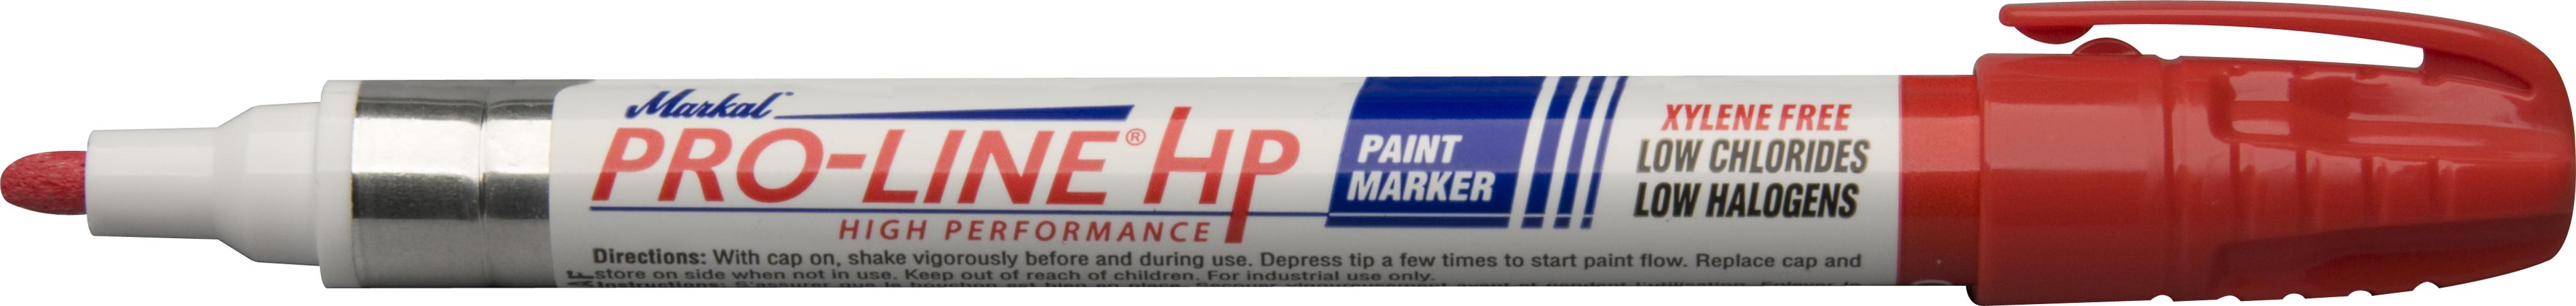 Markal Pro Line HP Paint Marker - Blue